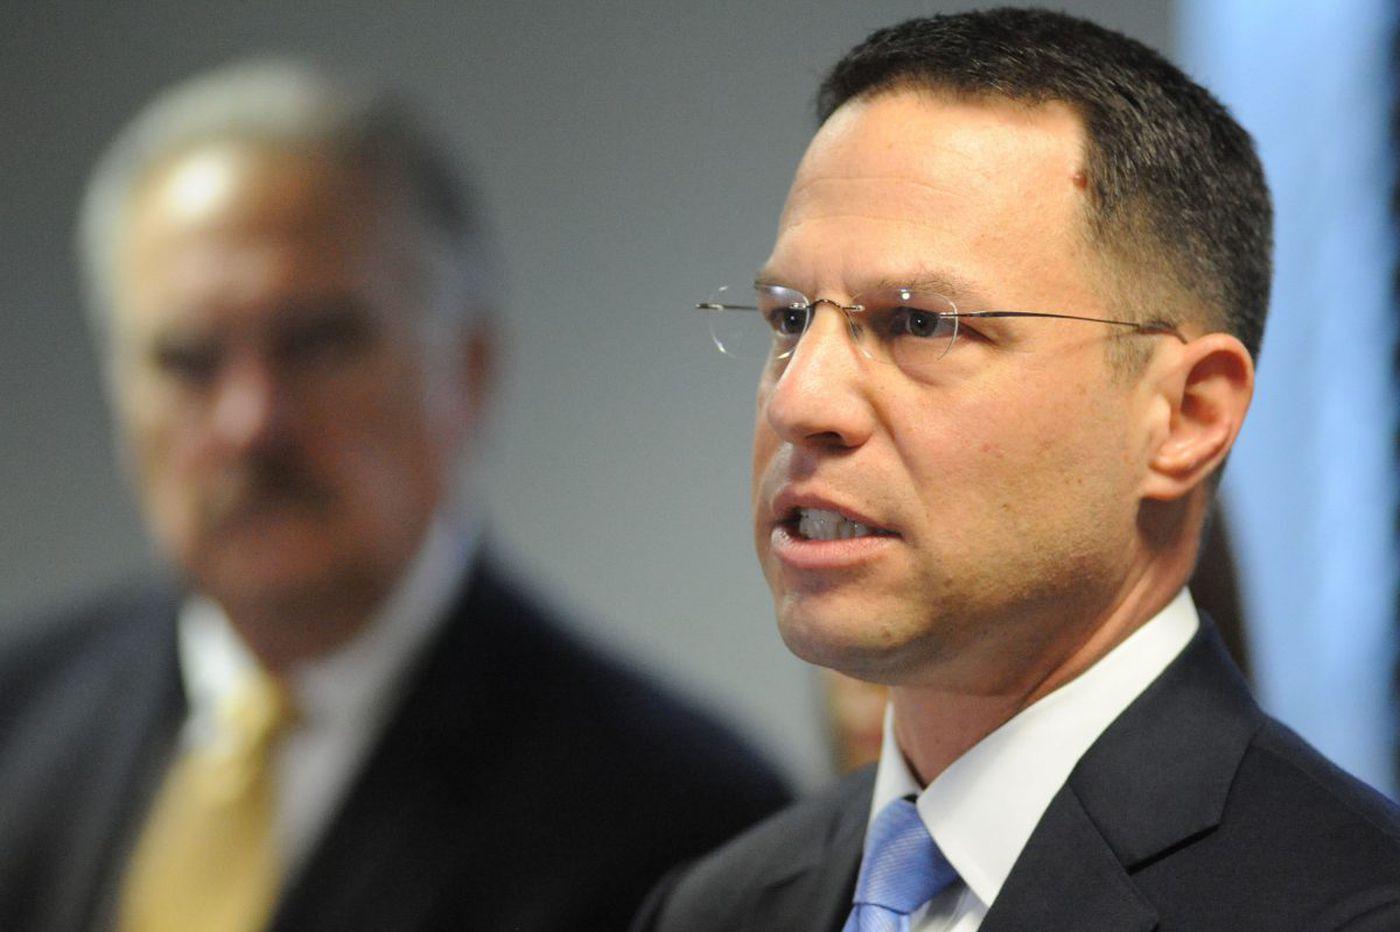 AG Josh Shapiro challenges insurers to improve addiction coverage